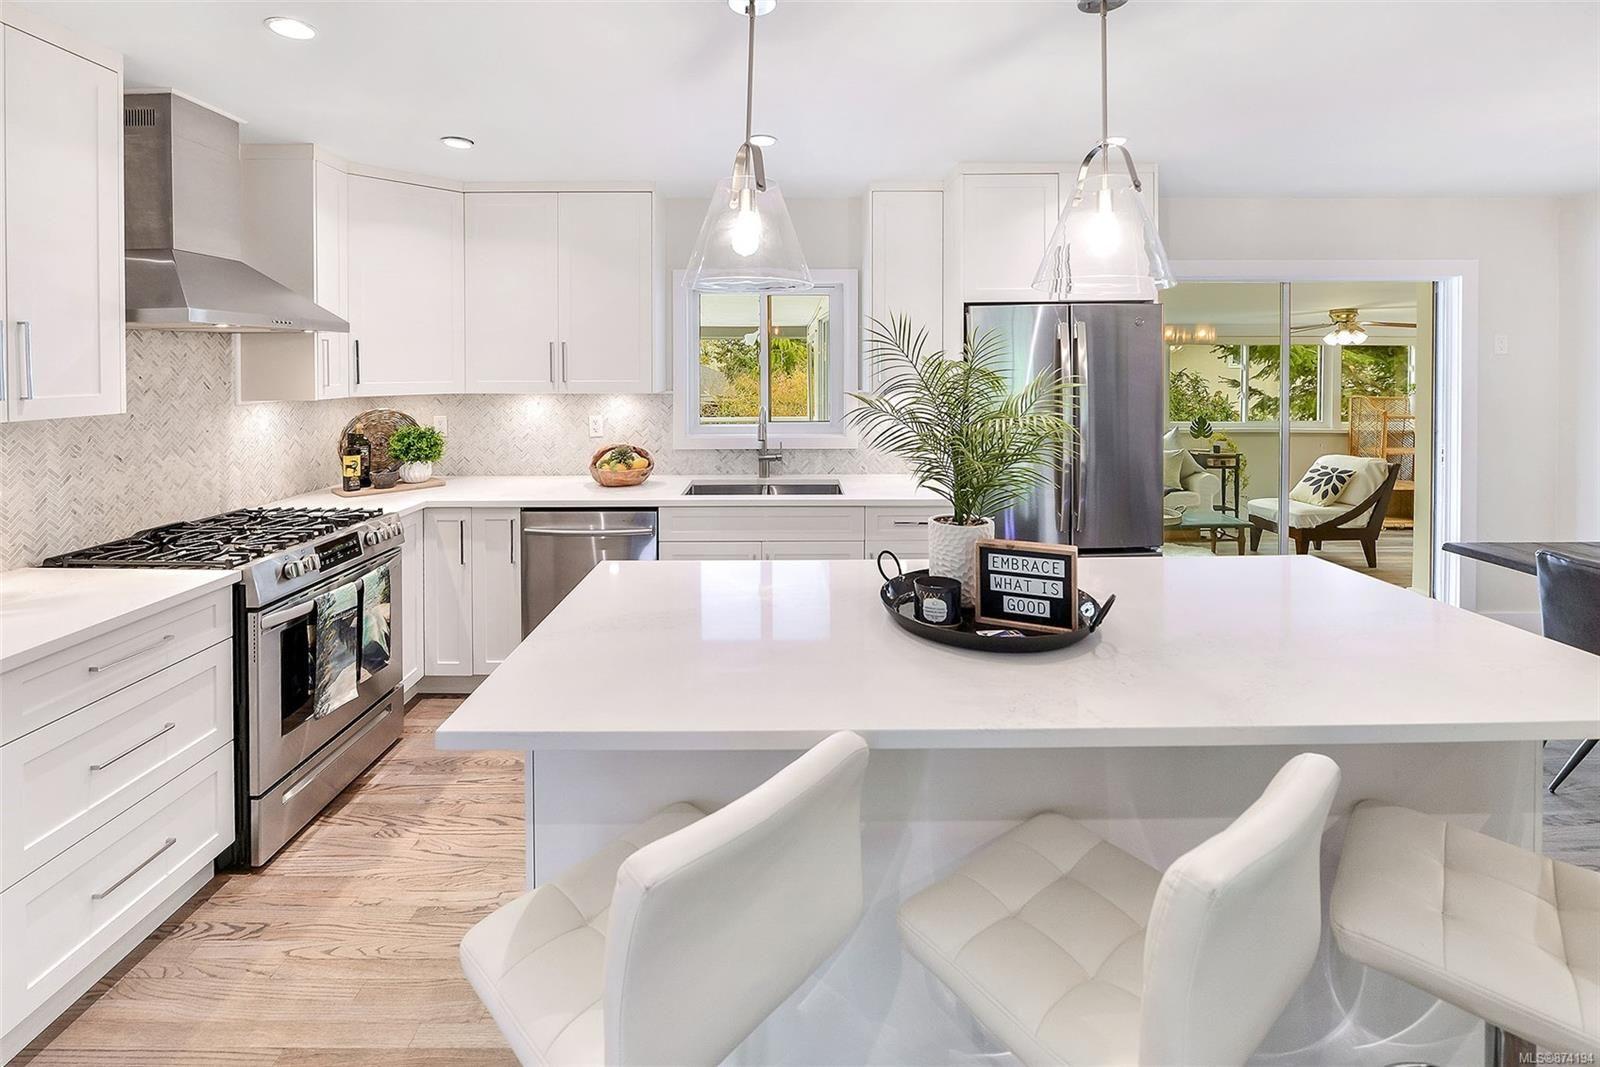 Main Photo: 4055 Saanich Rd in : SE High Quadra House for sale (Saanich East)  : MLS®# 874194